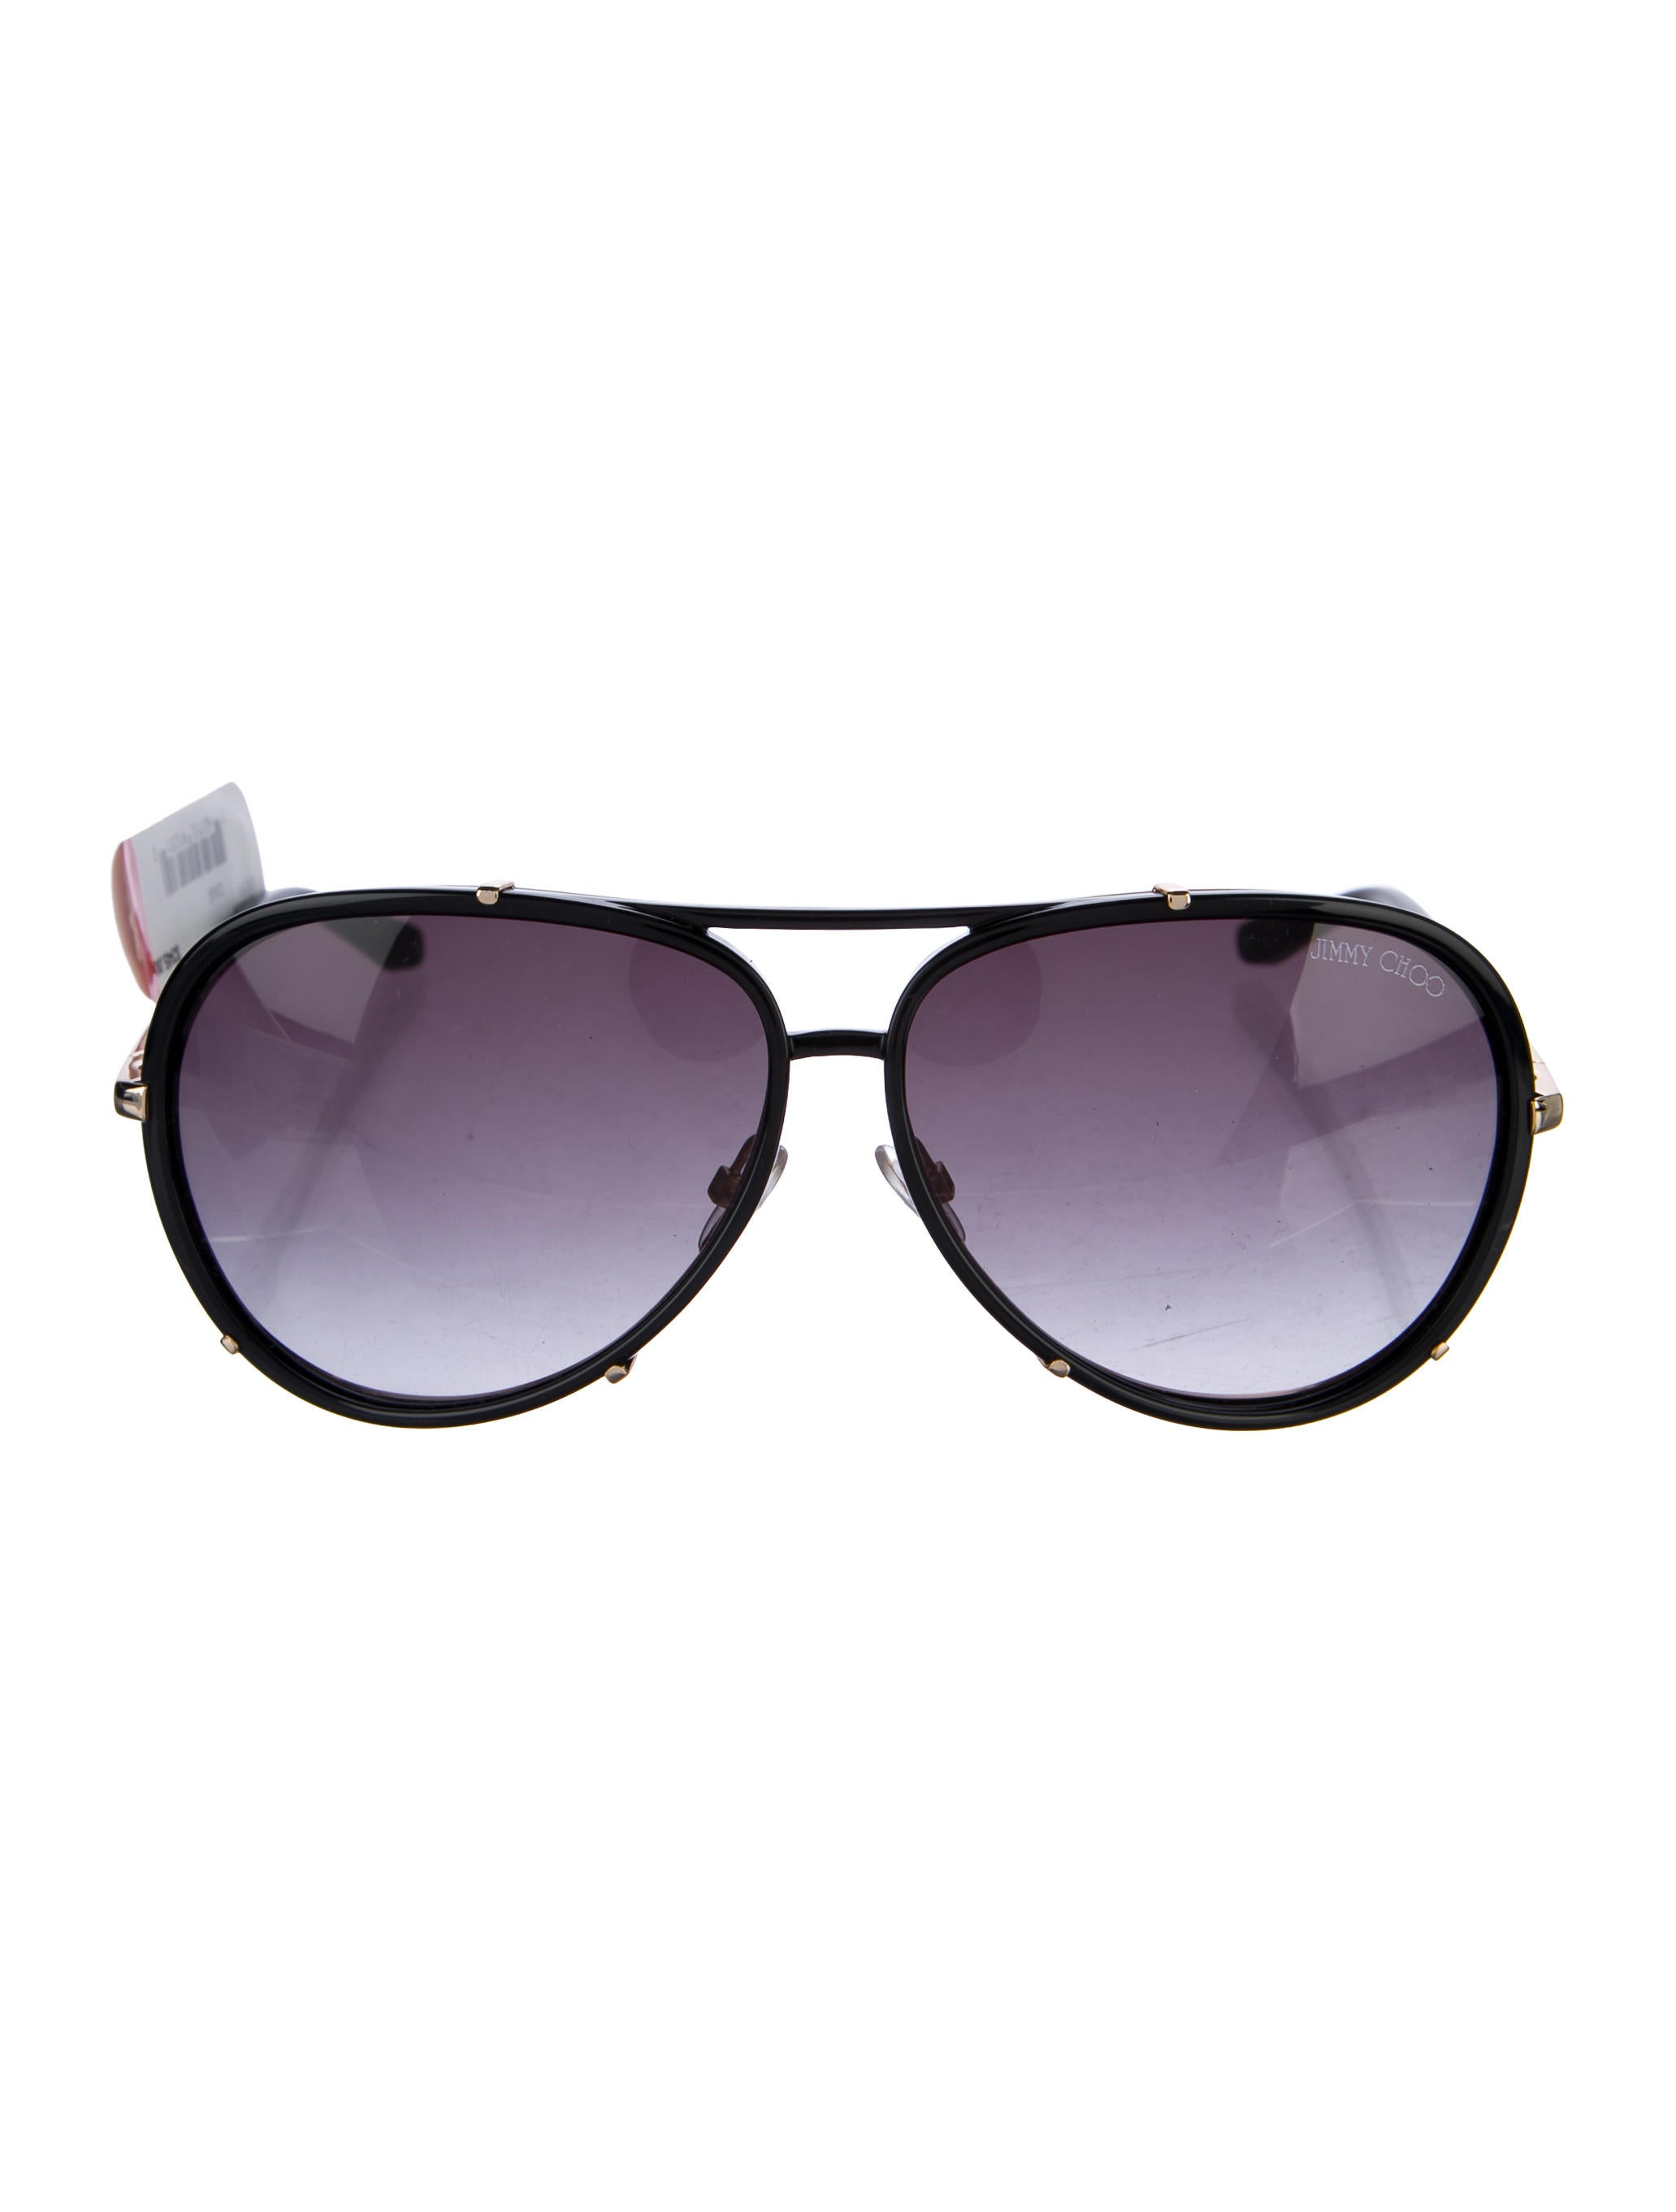 c8142395c289 Jimmy Choo Terrence Aviator Sunglasses - Accessories - JIM79693 ...